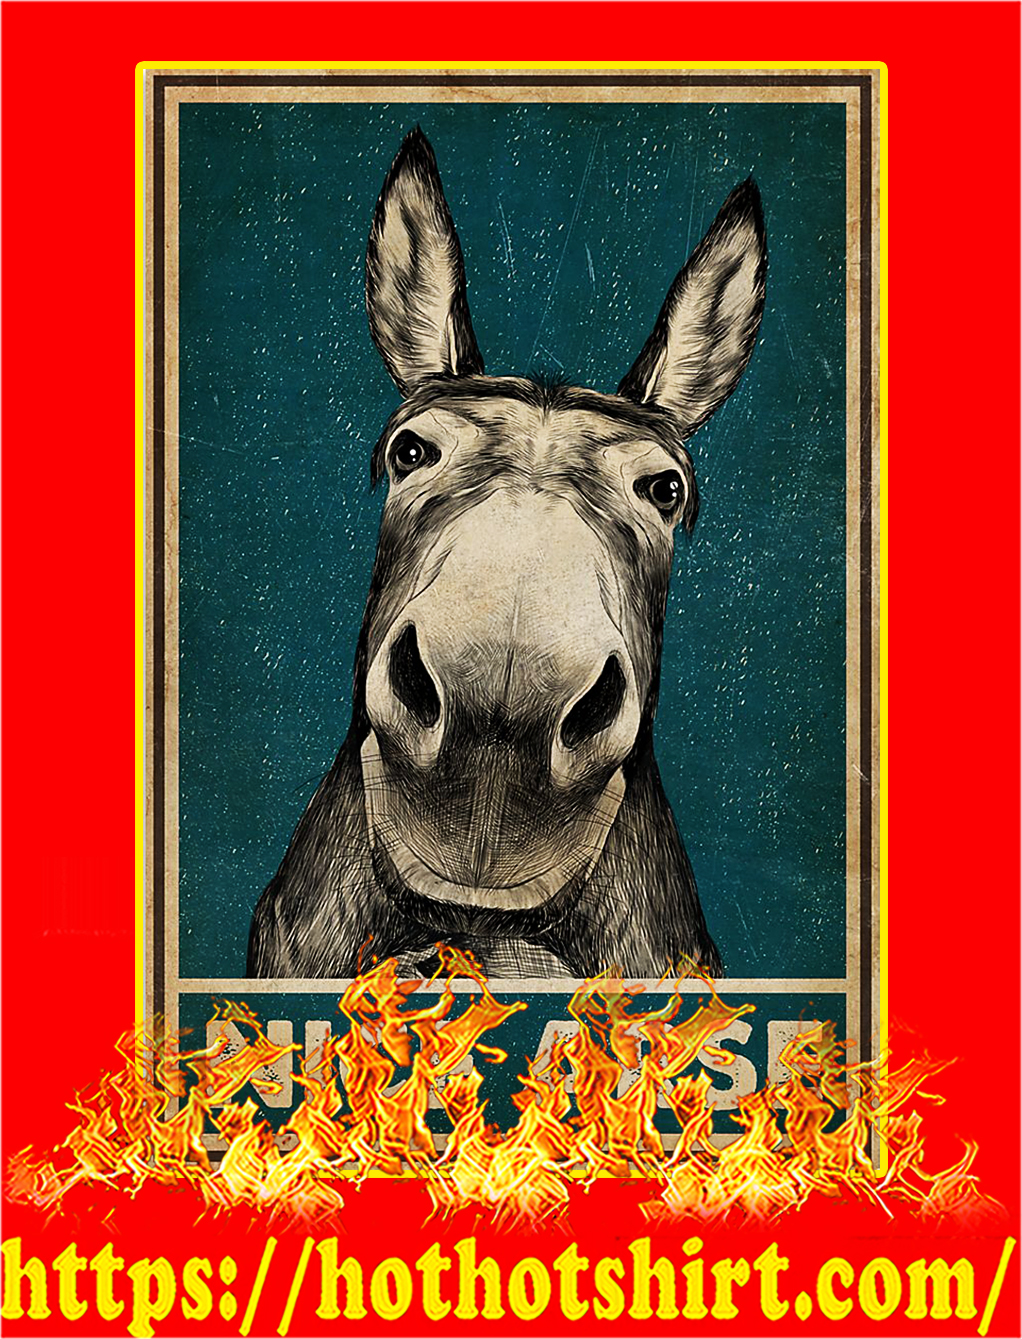 Nice arse donkey poster